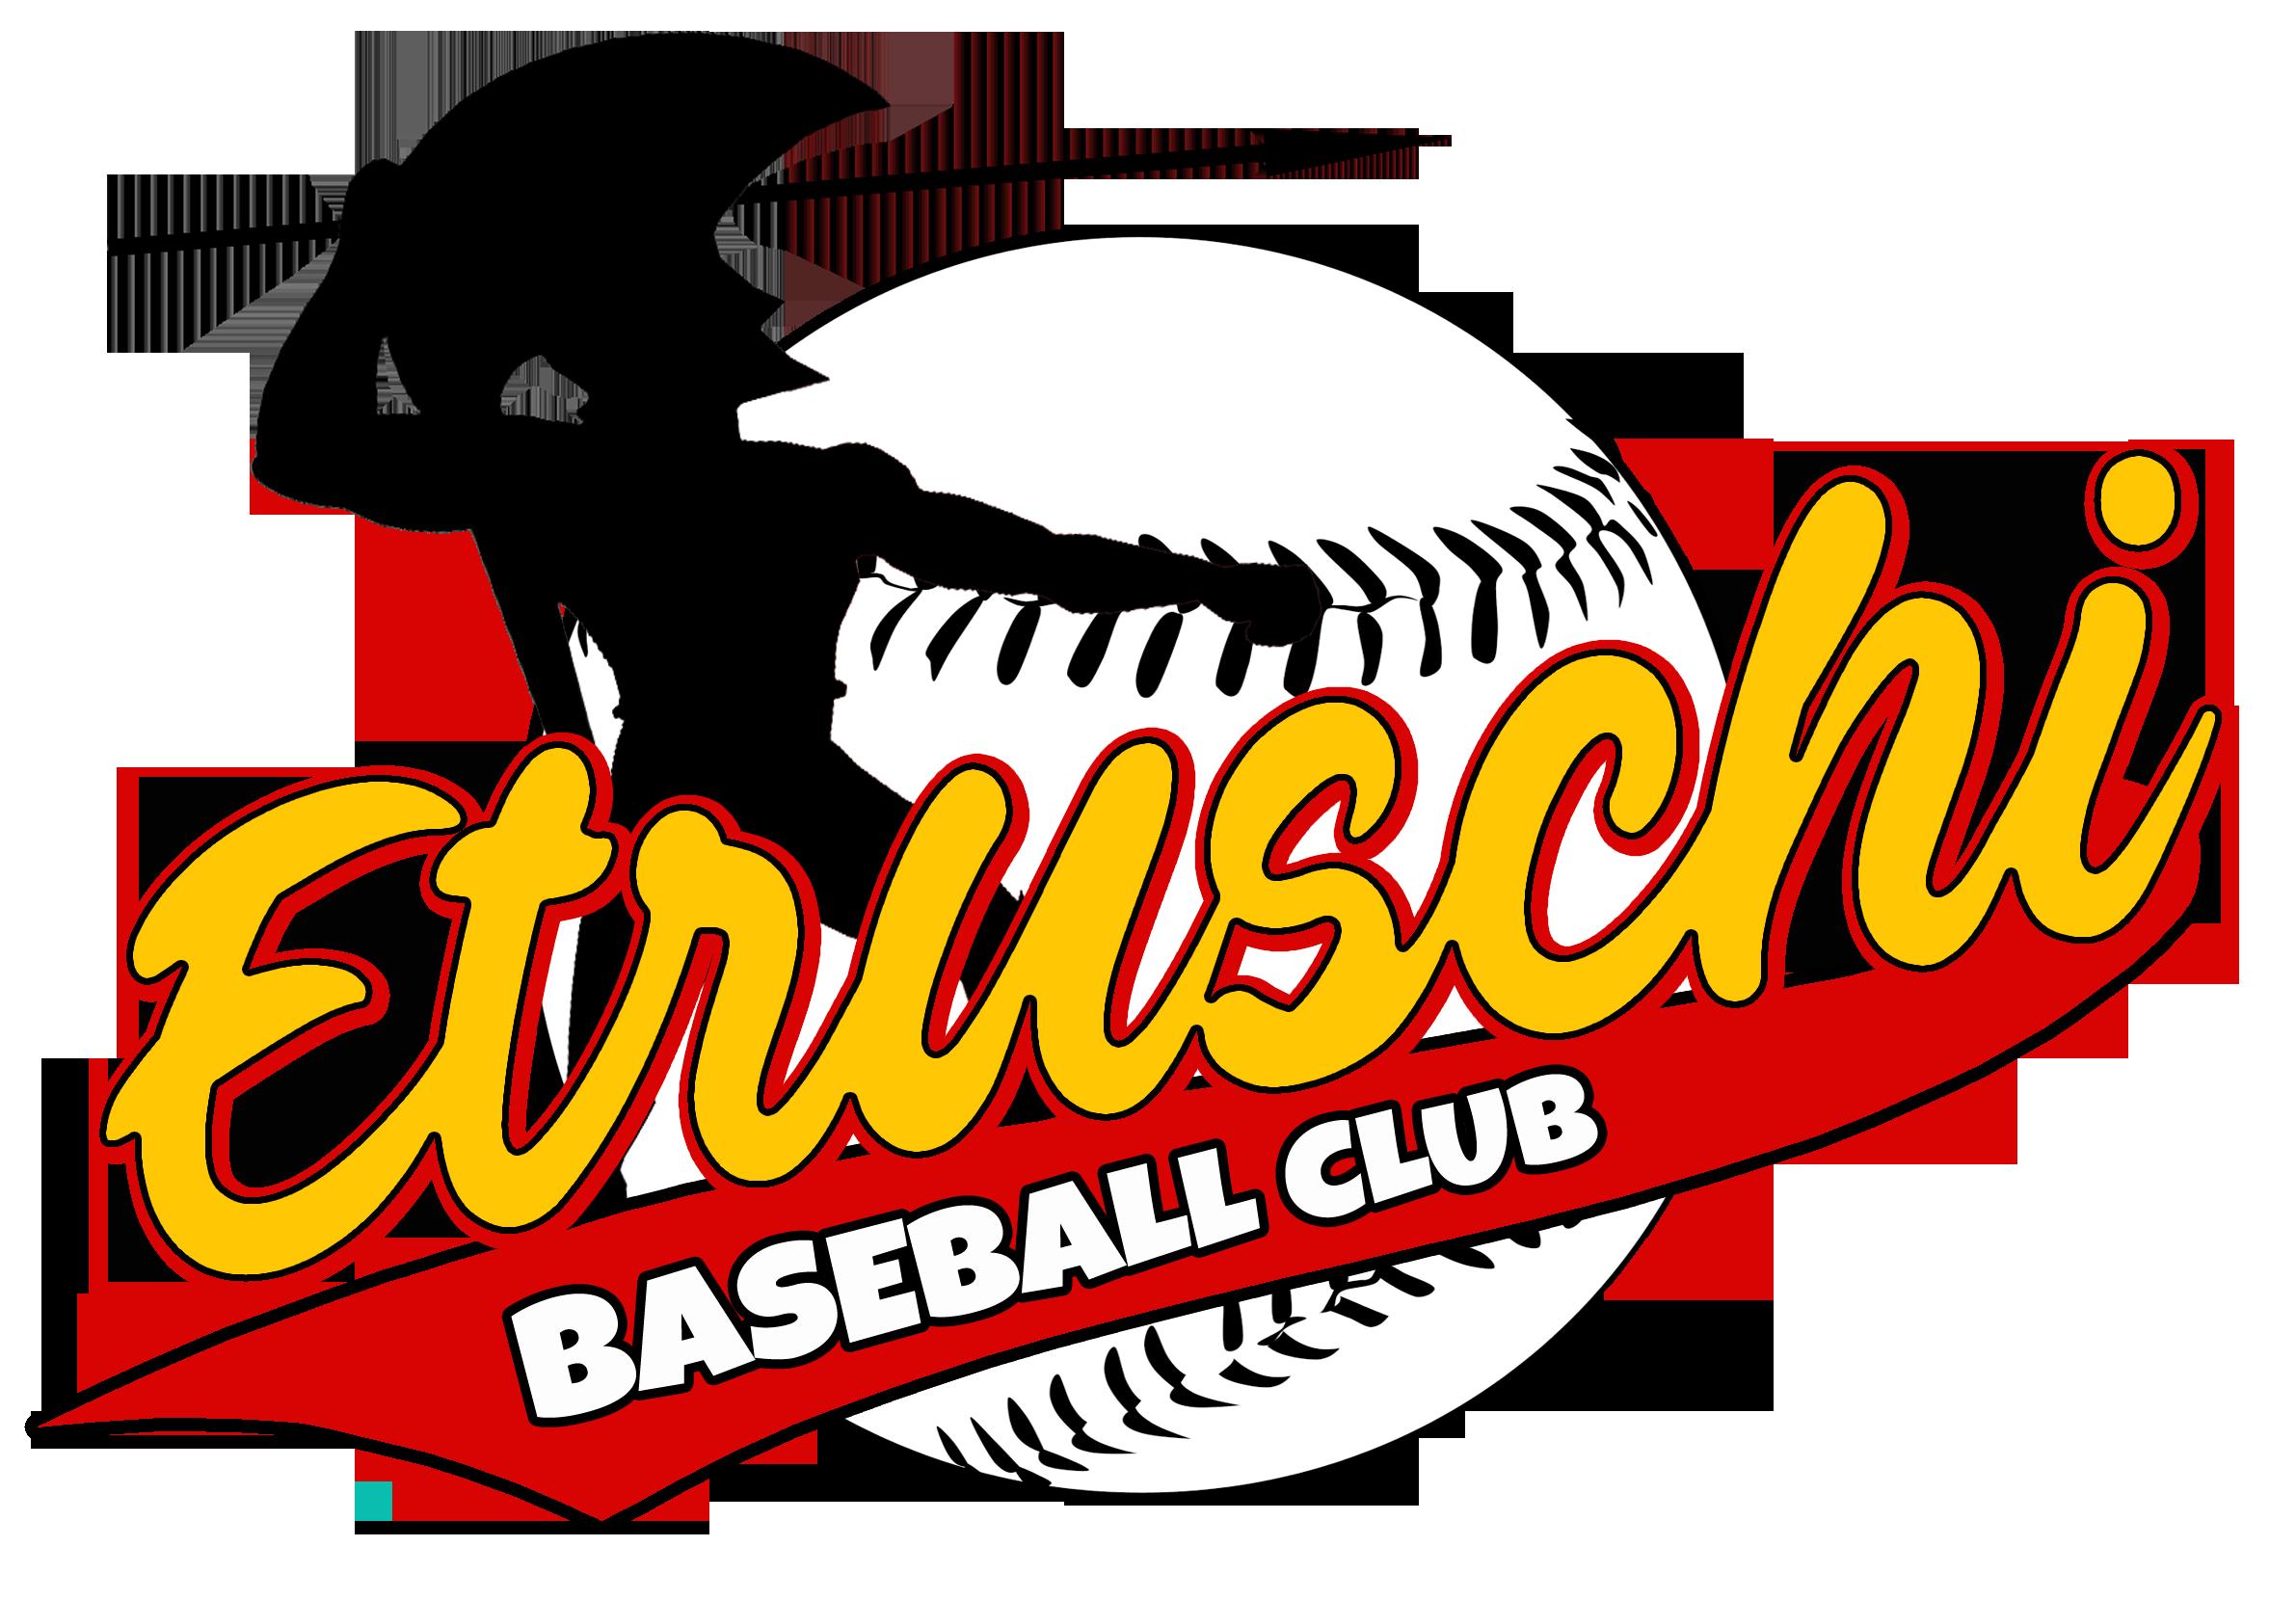 etruschi baseball